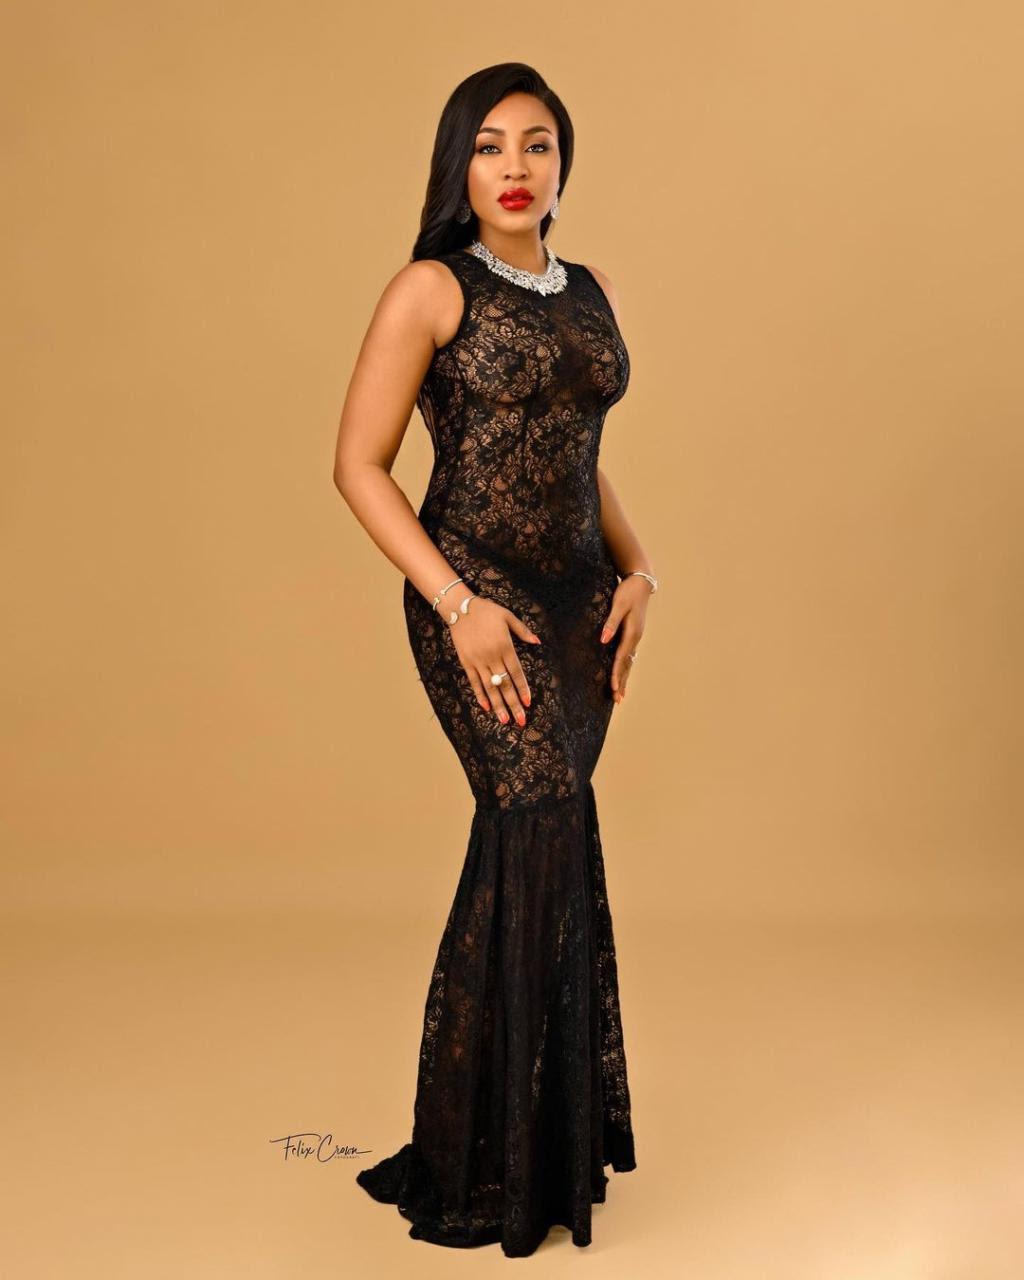 BBNaija star, Erica Nlewedim, flashes her boobs in lacy black dress (photos)